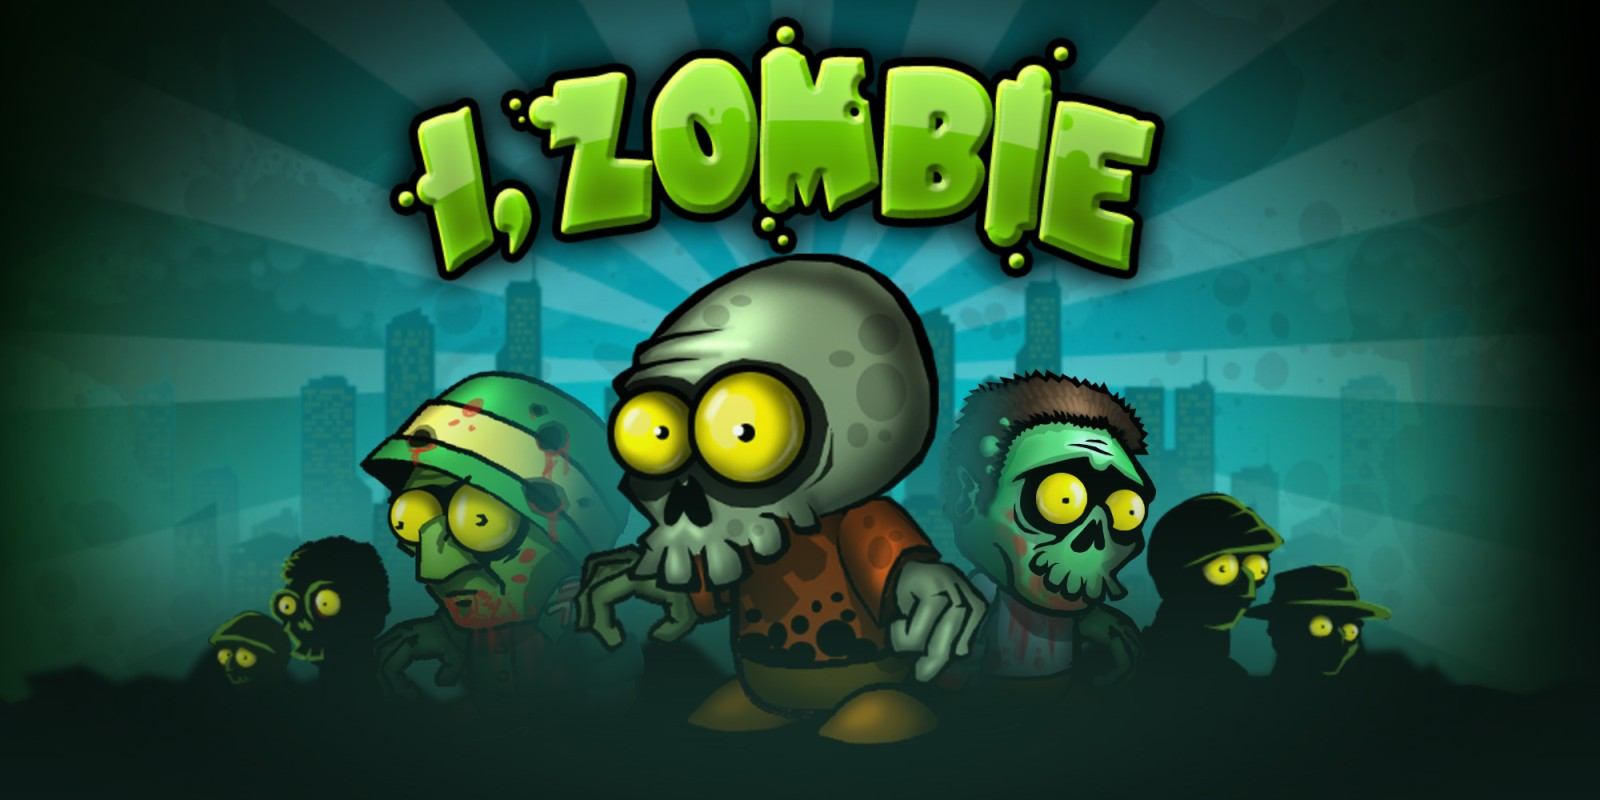 i zombie nintendo switch download software games nintendo